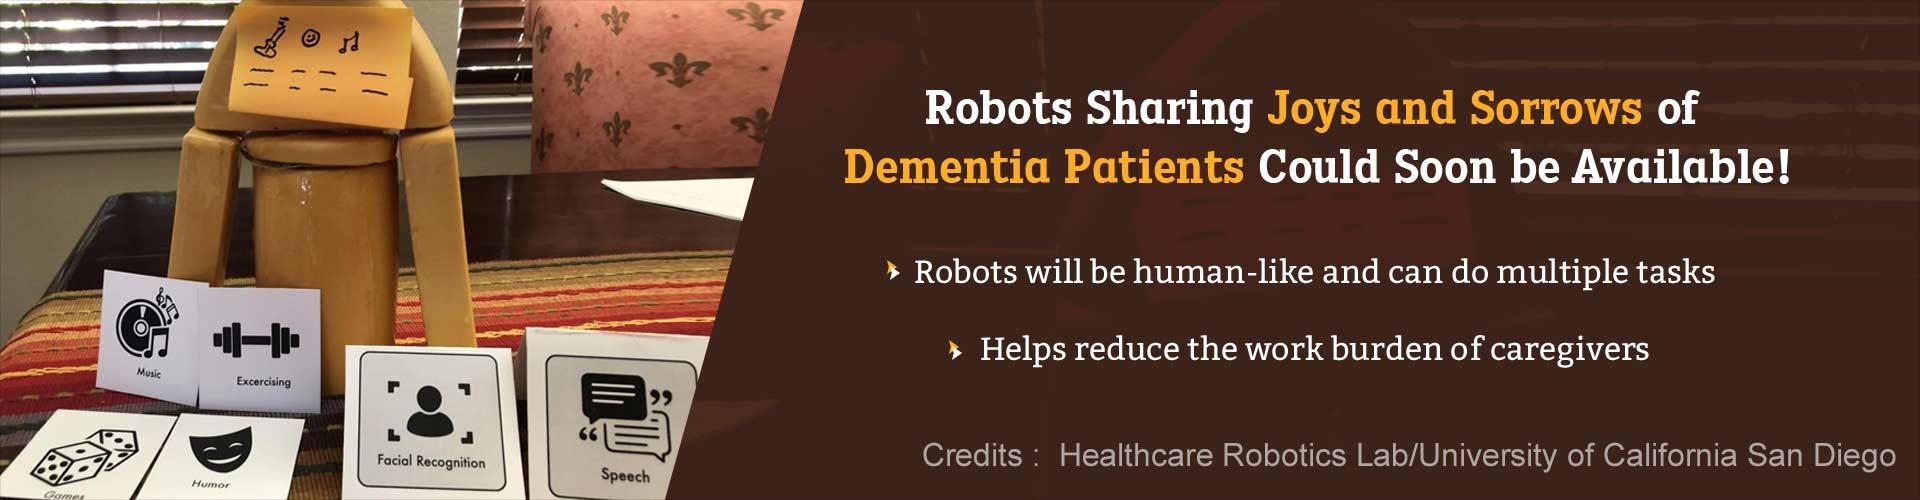 Robots Understand a Dementia Patient's Joy and Sorrow